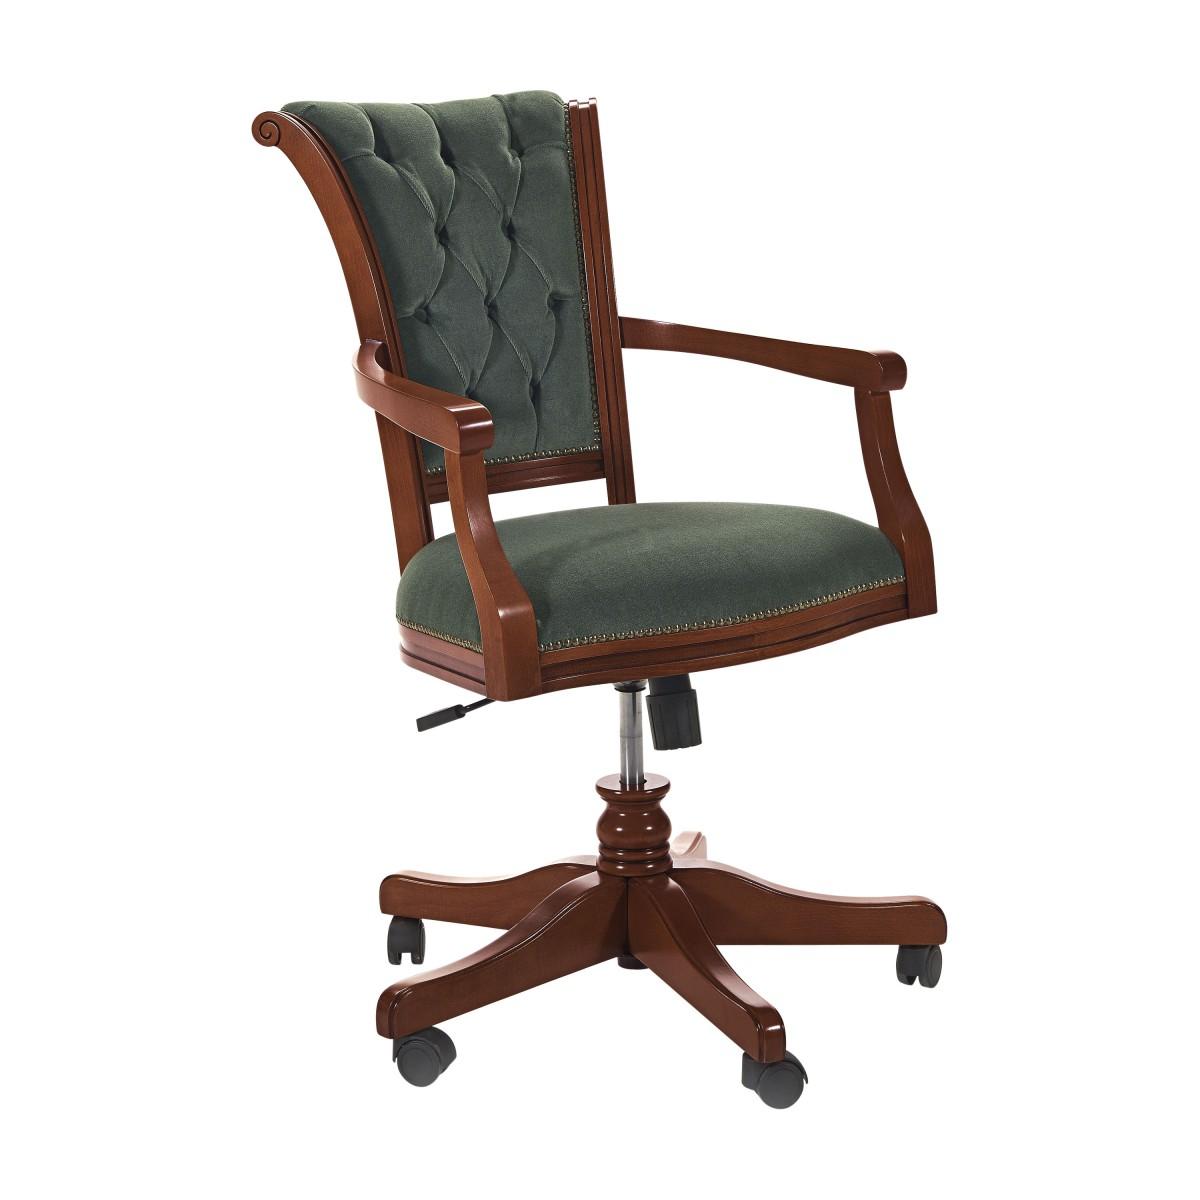 classic swivel chair paris 5795